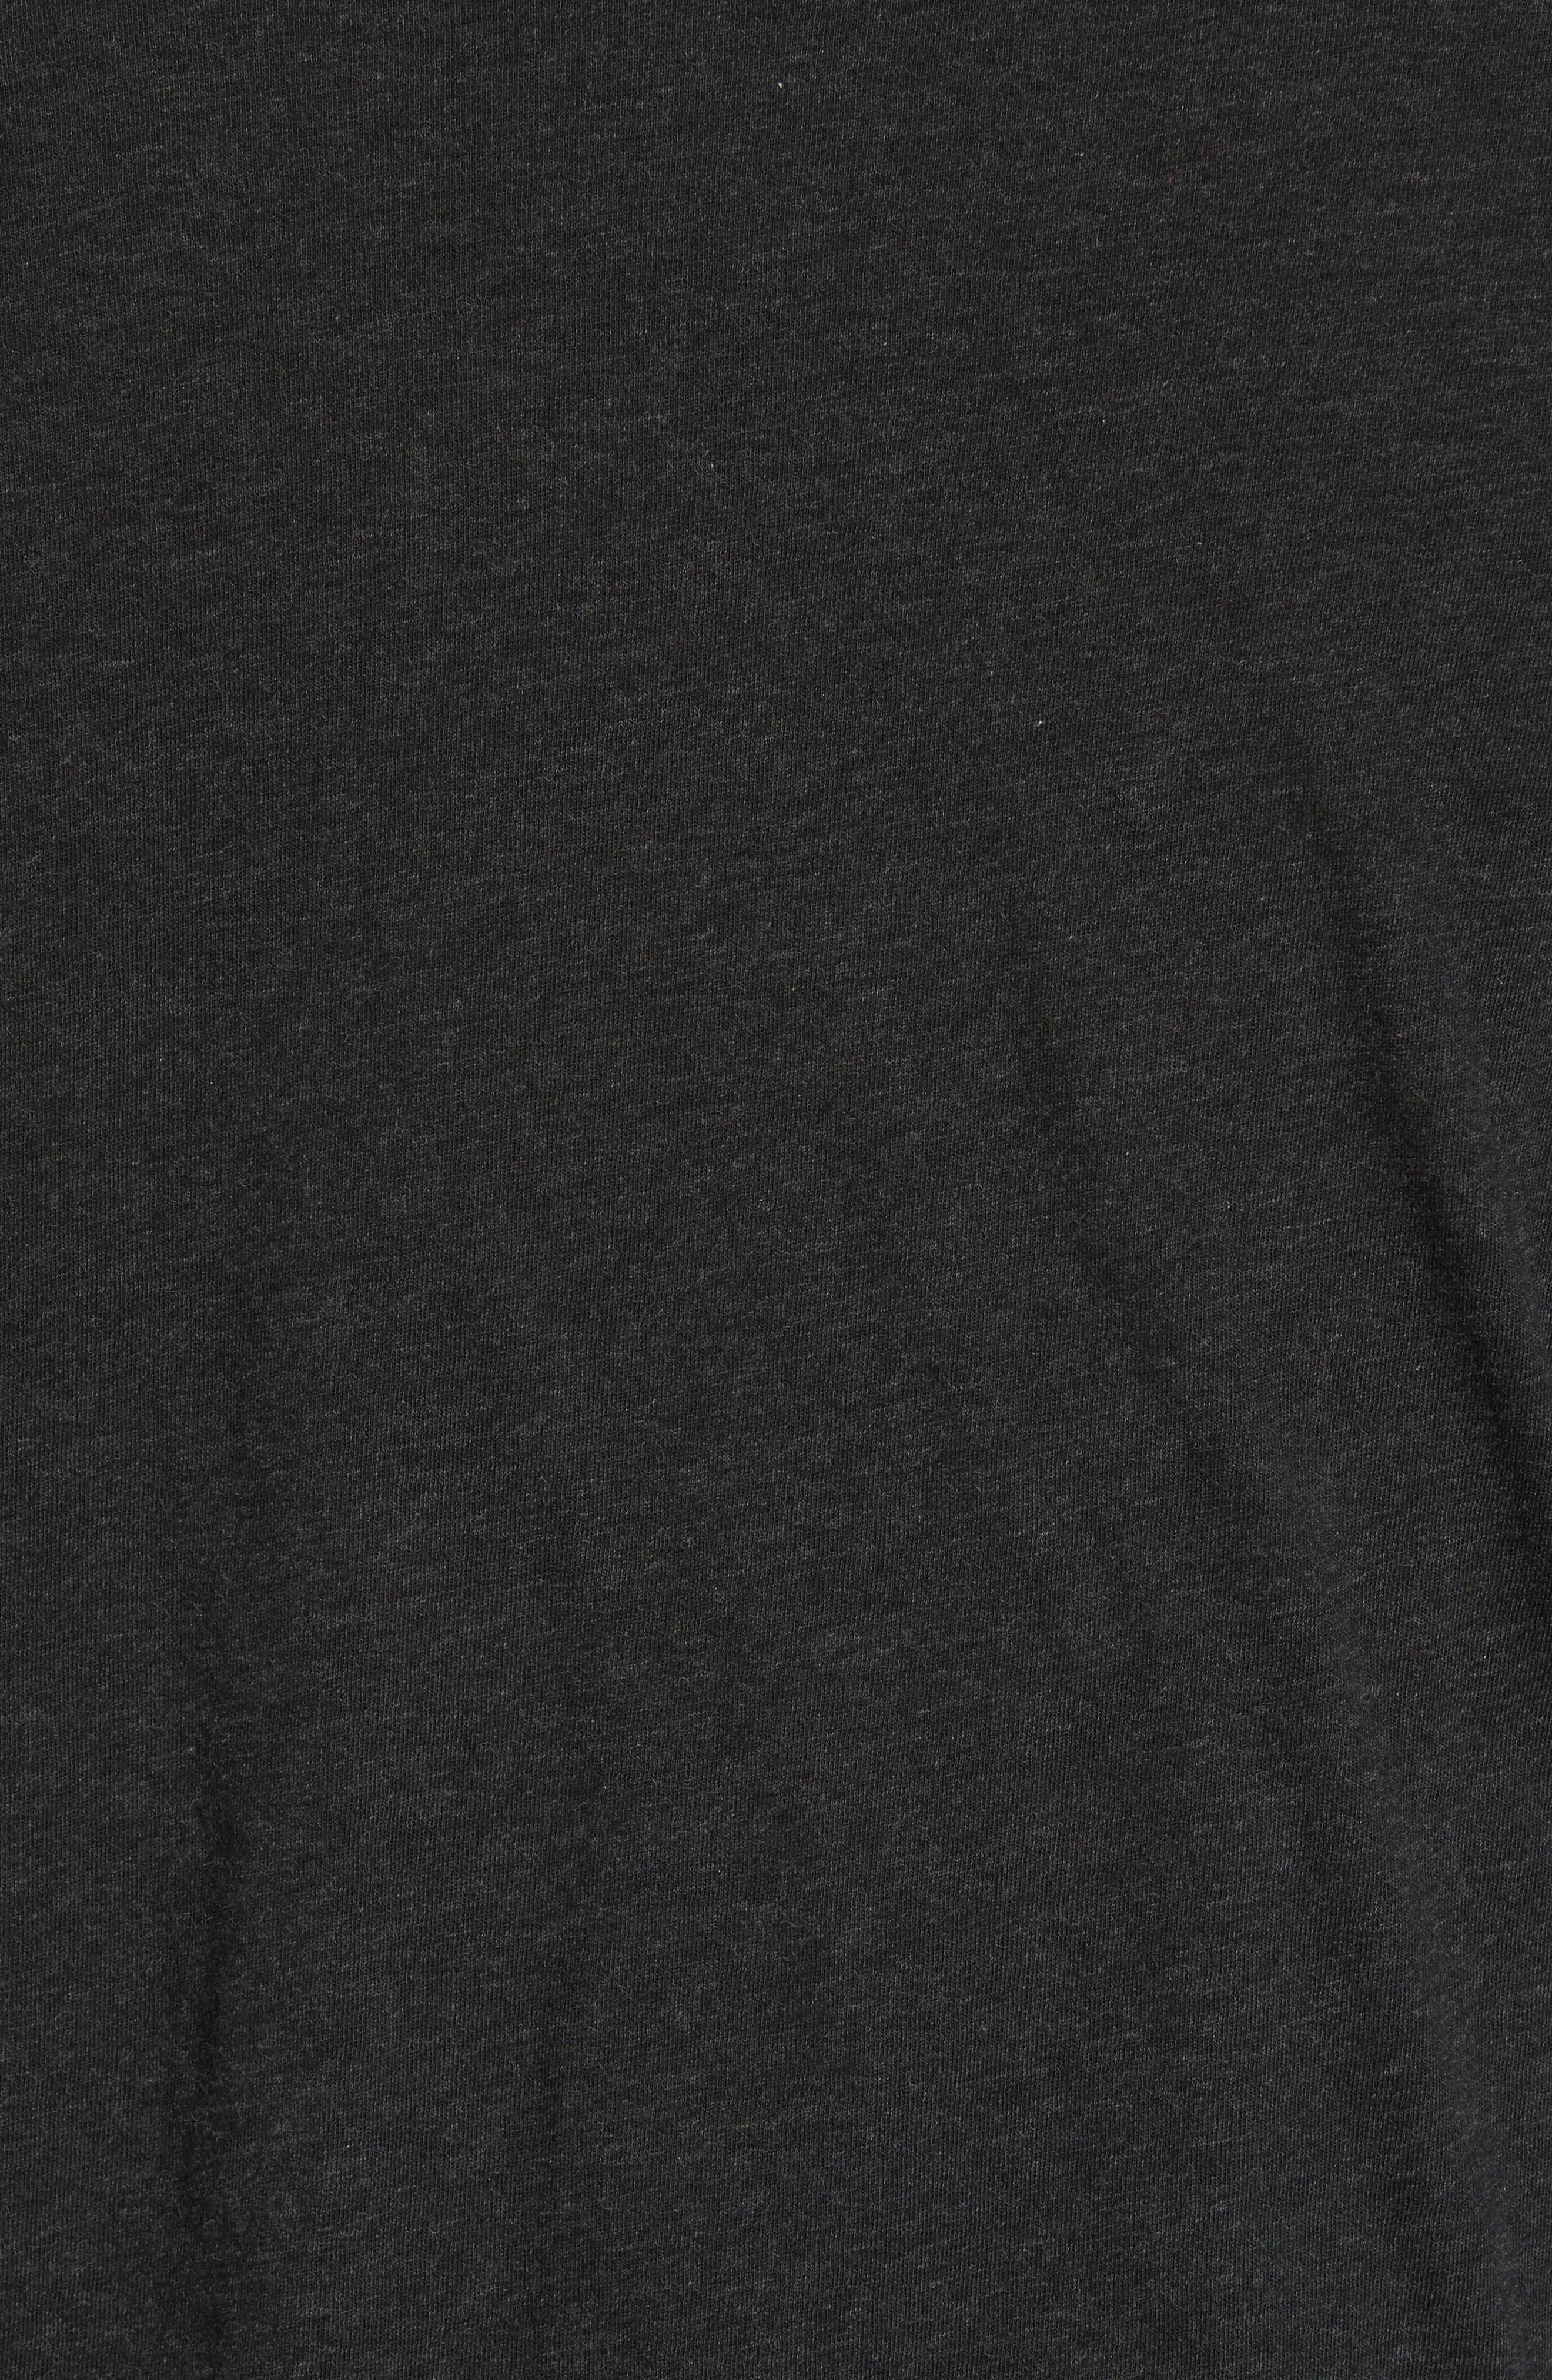 Utley Reversible Henley,                             Alternate thumbnail 5, color,                             Black Heather